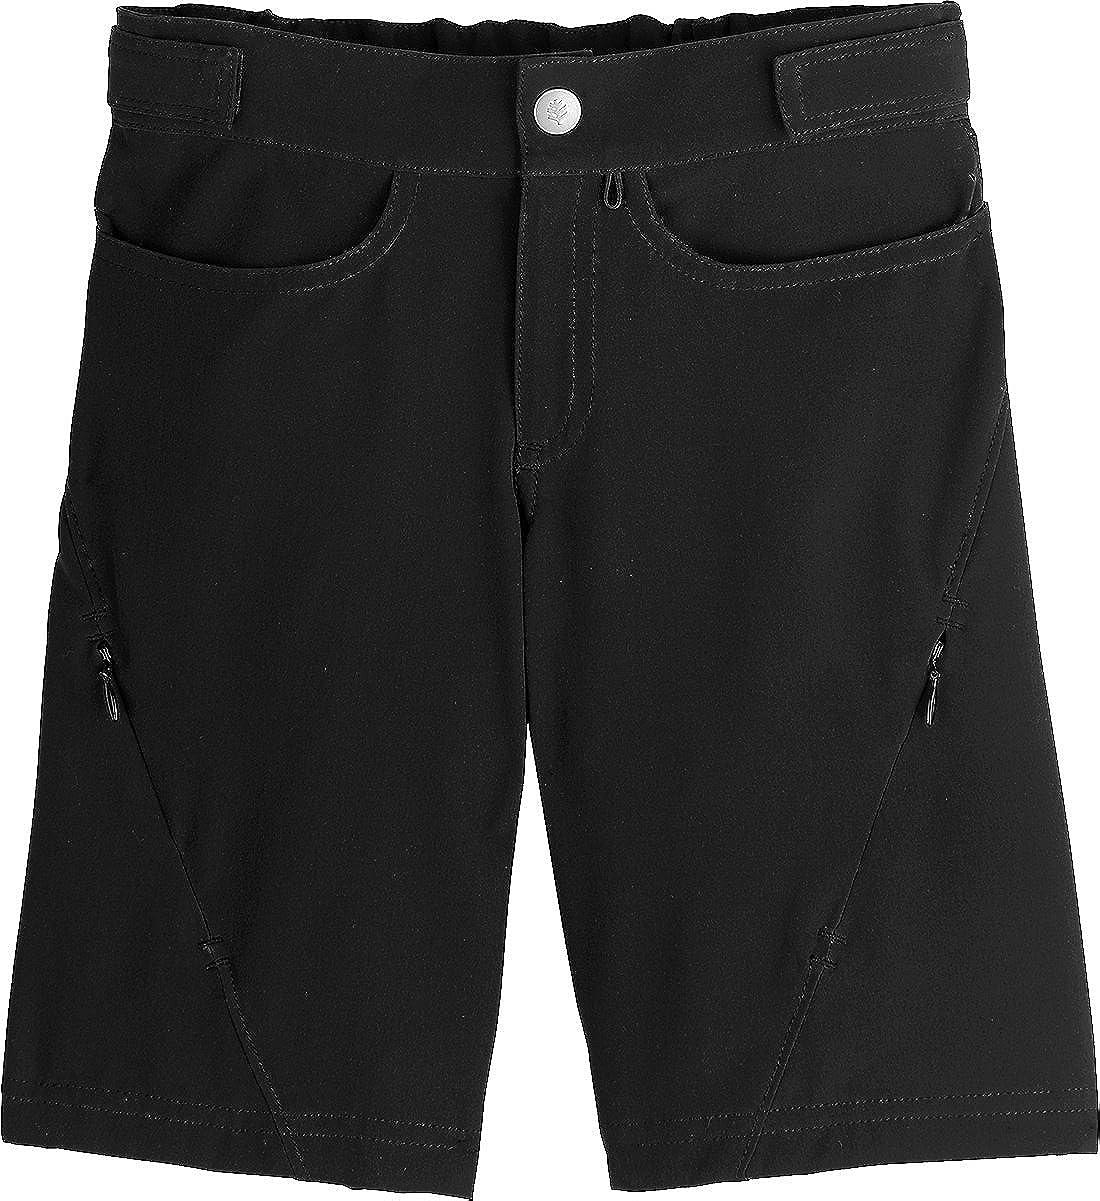 eebbb127591 Amazon.com  Coolibar UPF 50+ Boys  Tech Swim Trunks - Sun Protective   Clothing